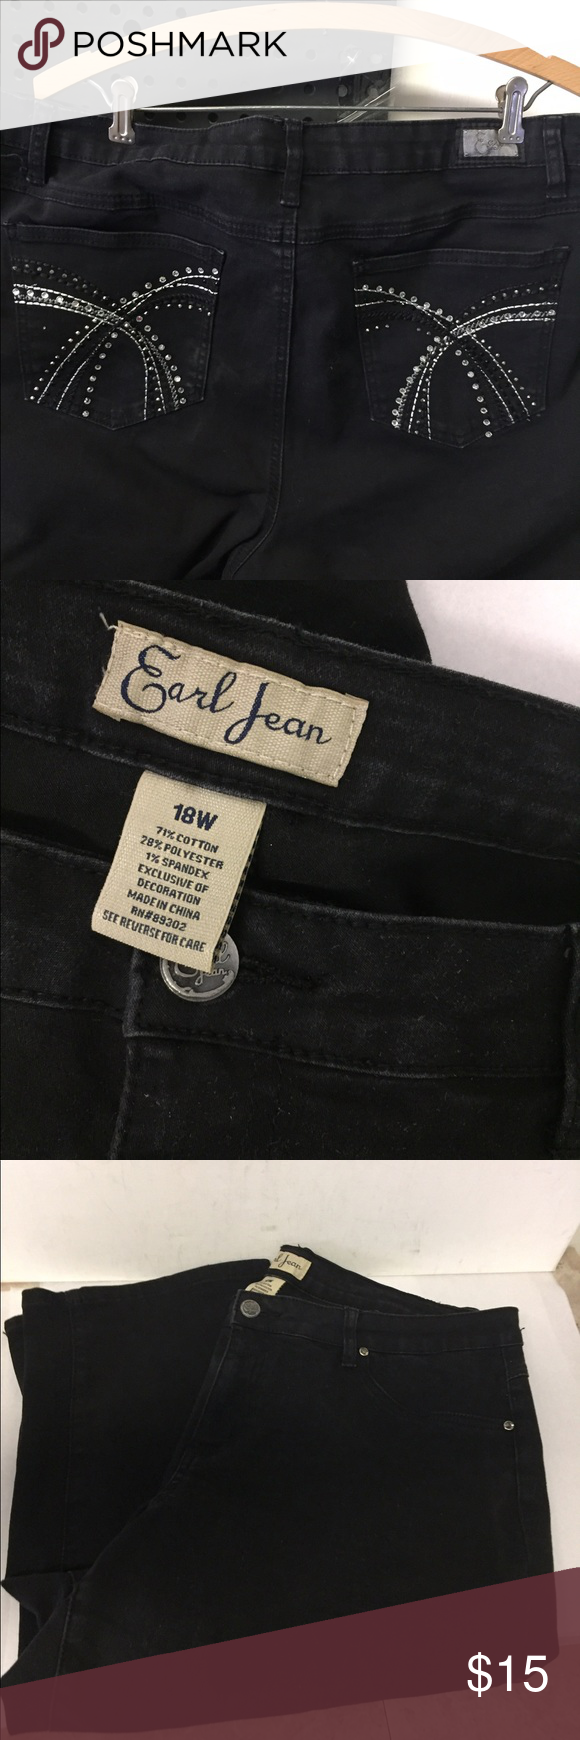 "Earl Black Denim Capri Pants sz 18W Black denim Capri Jeans. Waist up to 40-44"". Rise up to 10 1/2"".  Inseam 20"". Earl Jeans Pants Capris"